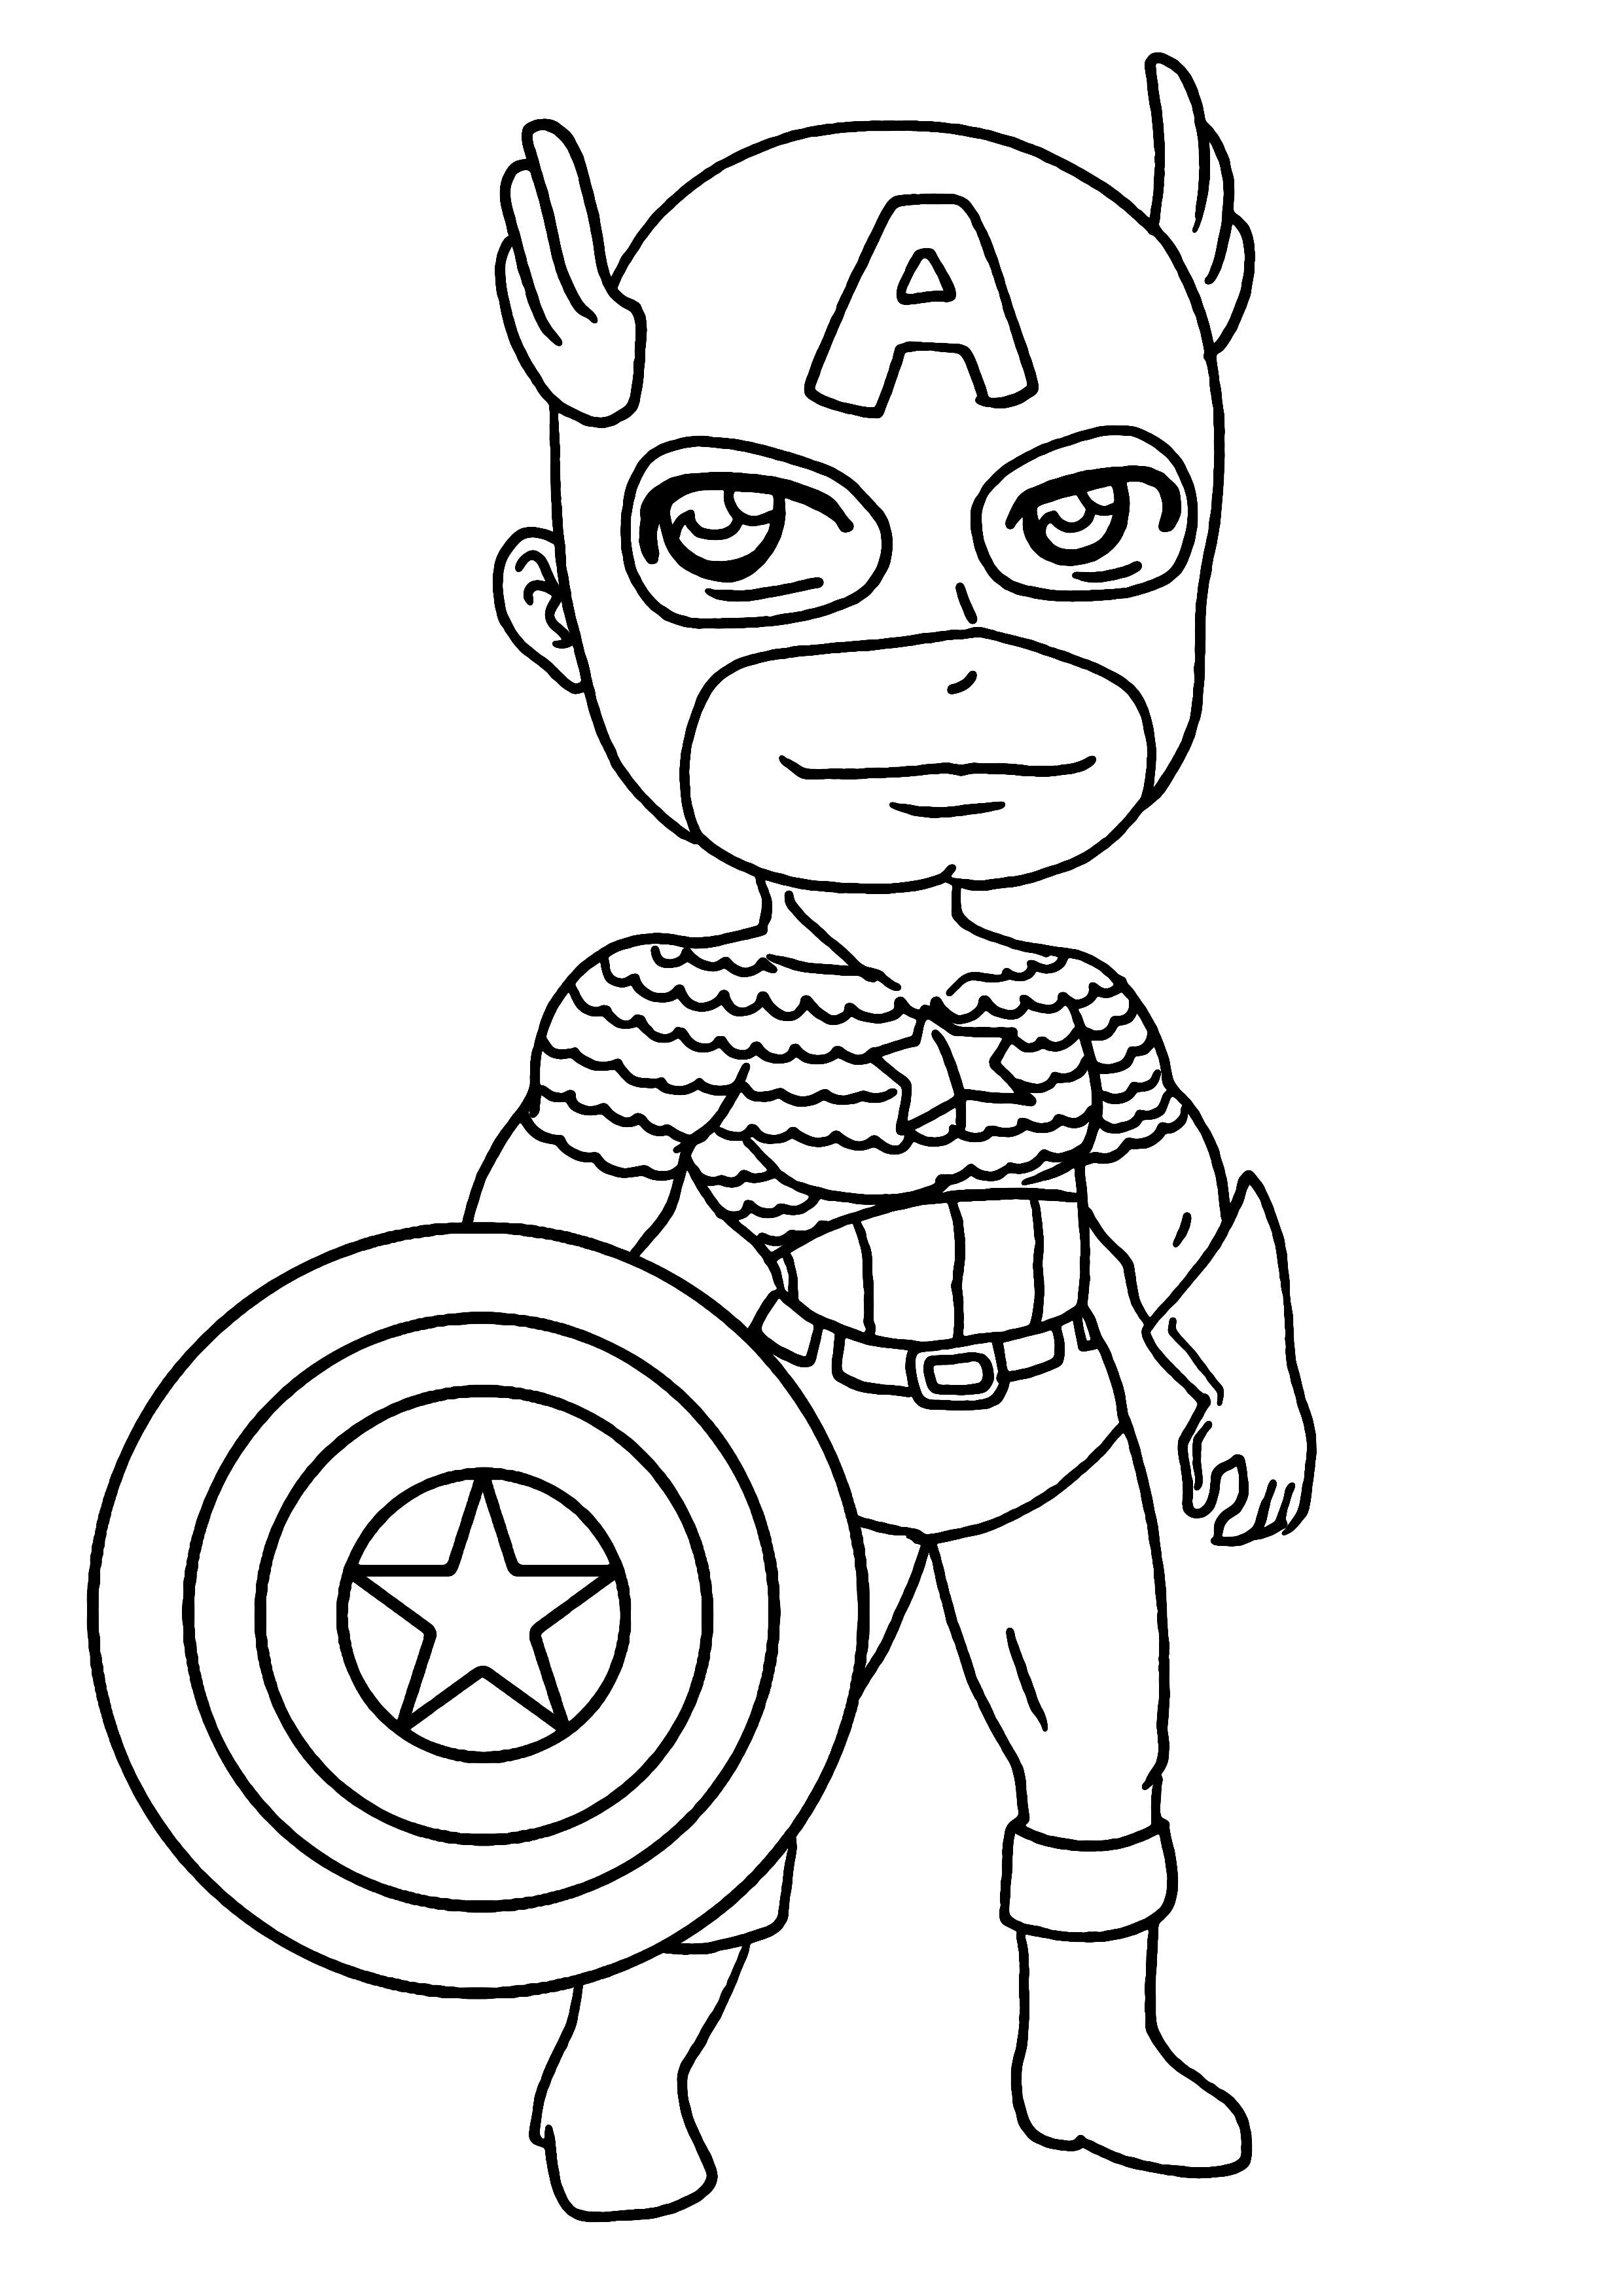 156 Dibujos De Capitán América Para Colorear Oh Kids Page 3